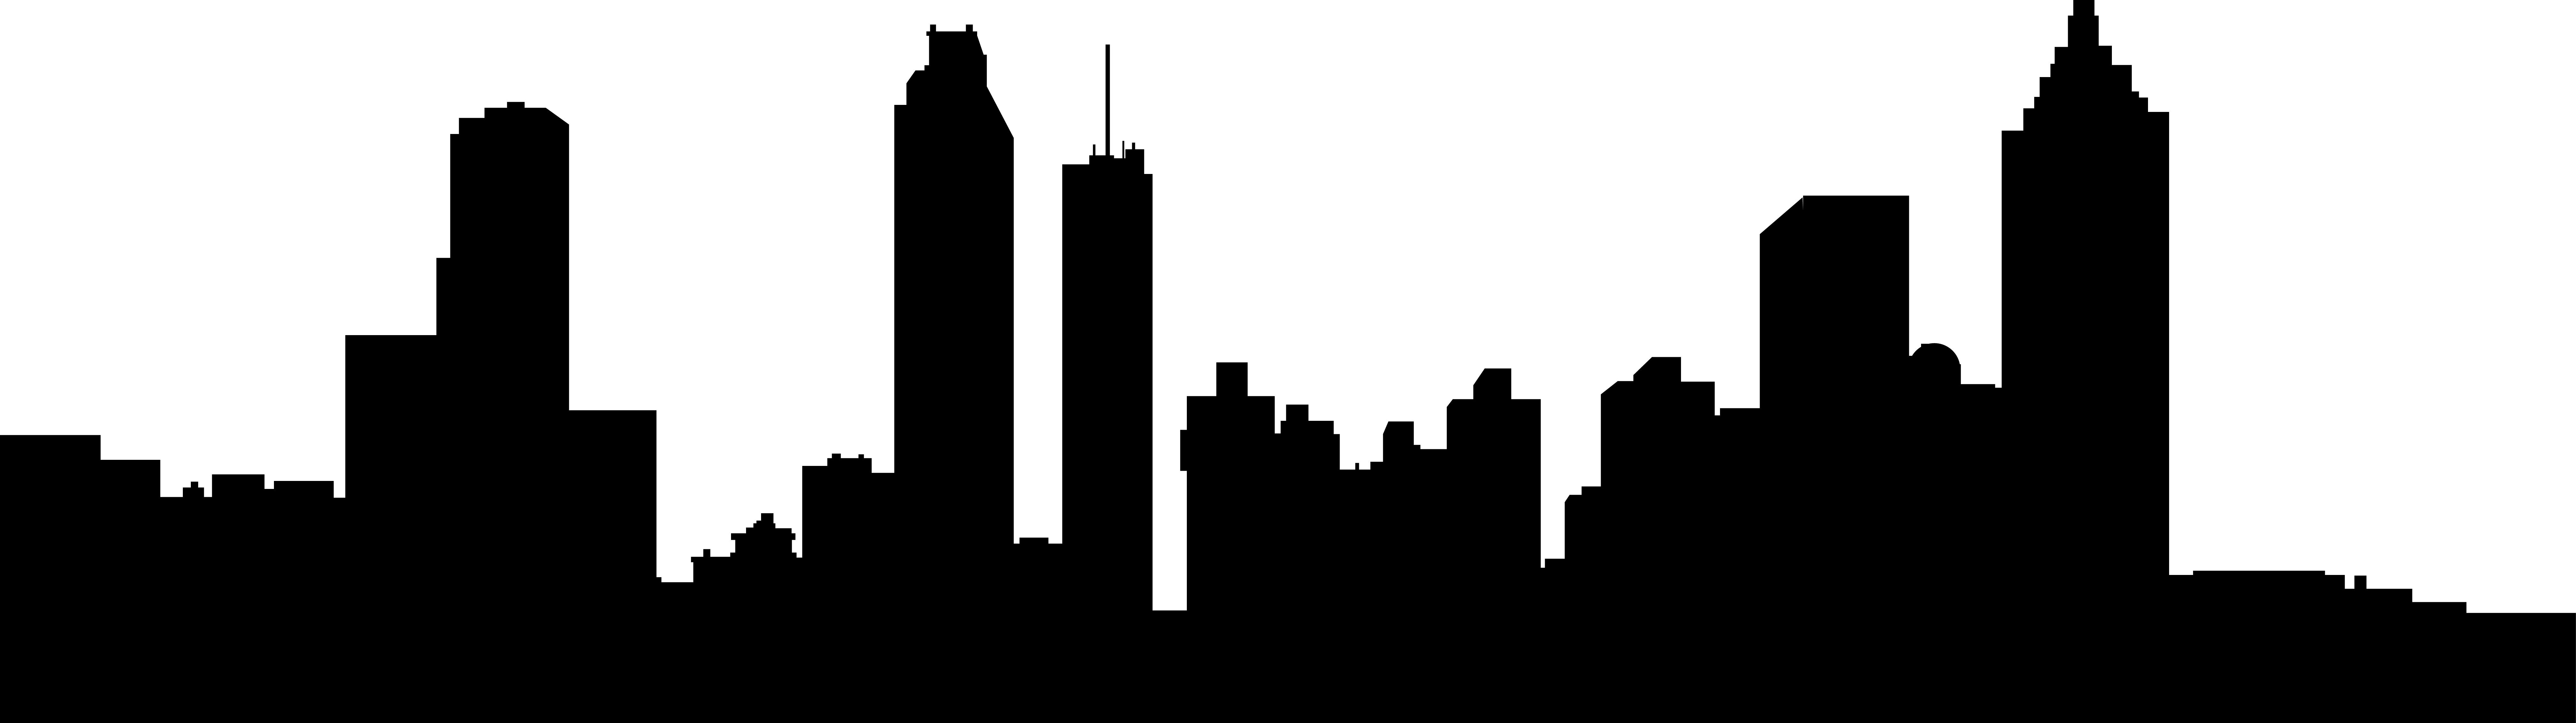 8059x2261 Cityscape Clipart Simple